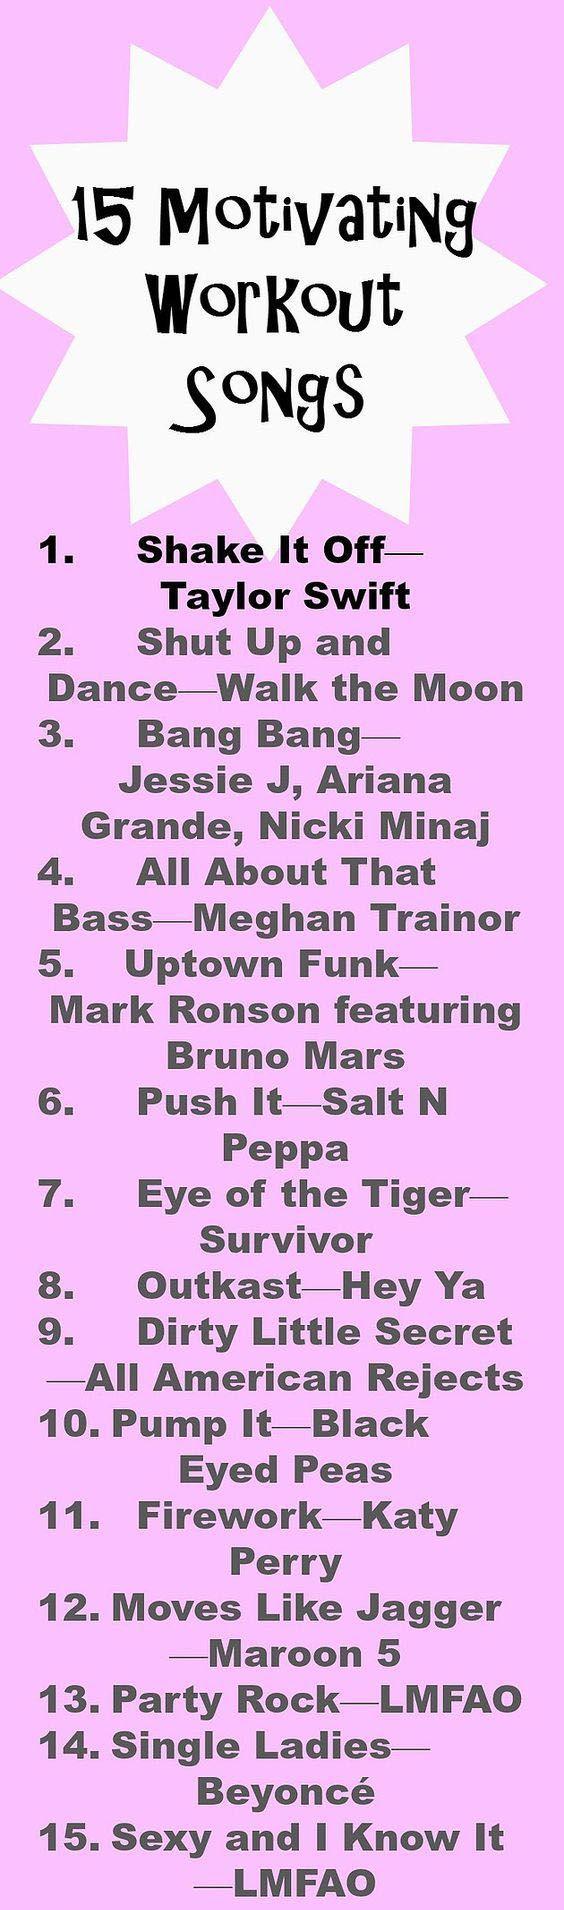 Workout Music Playlist Cardio und HIIT #musicsongs